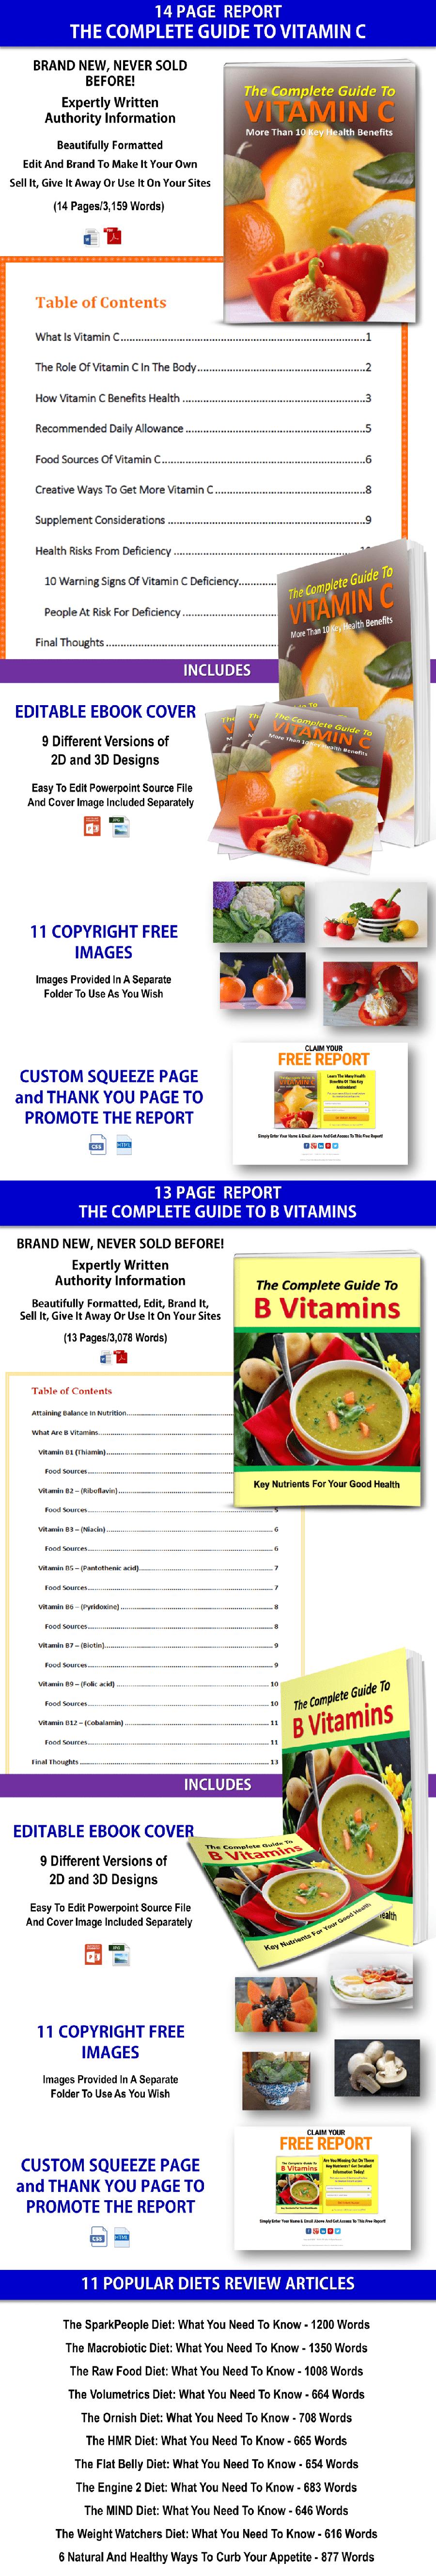 Vitamins And Popular Diets PLR